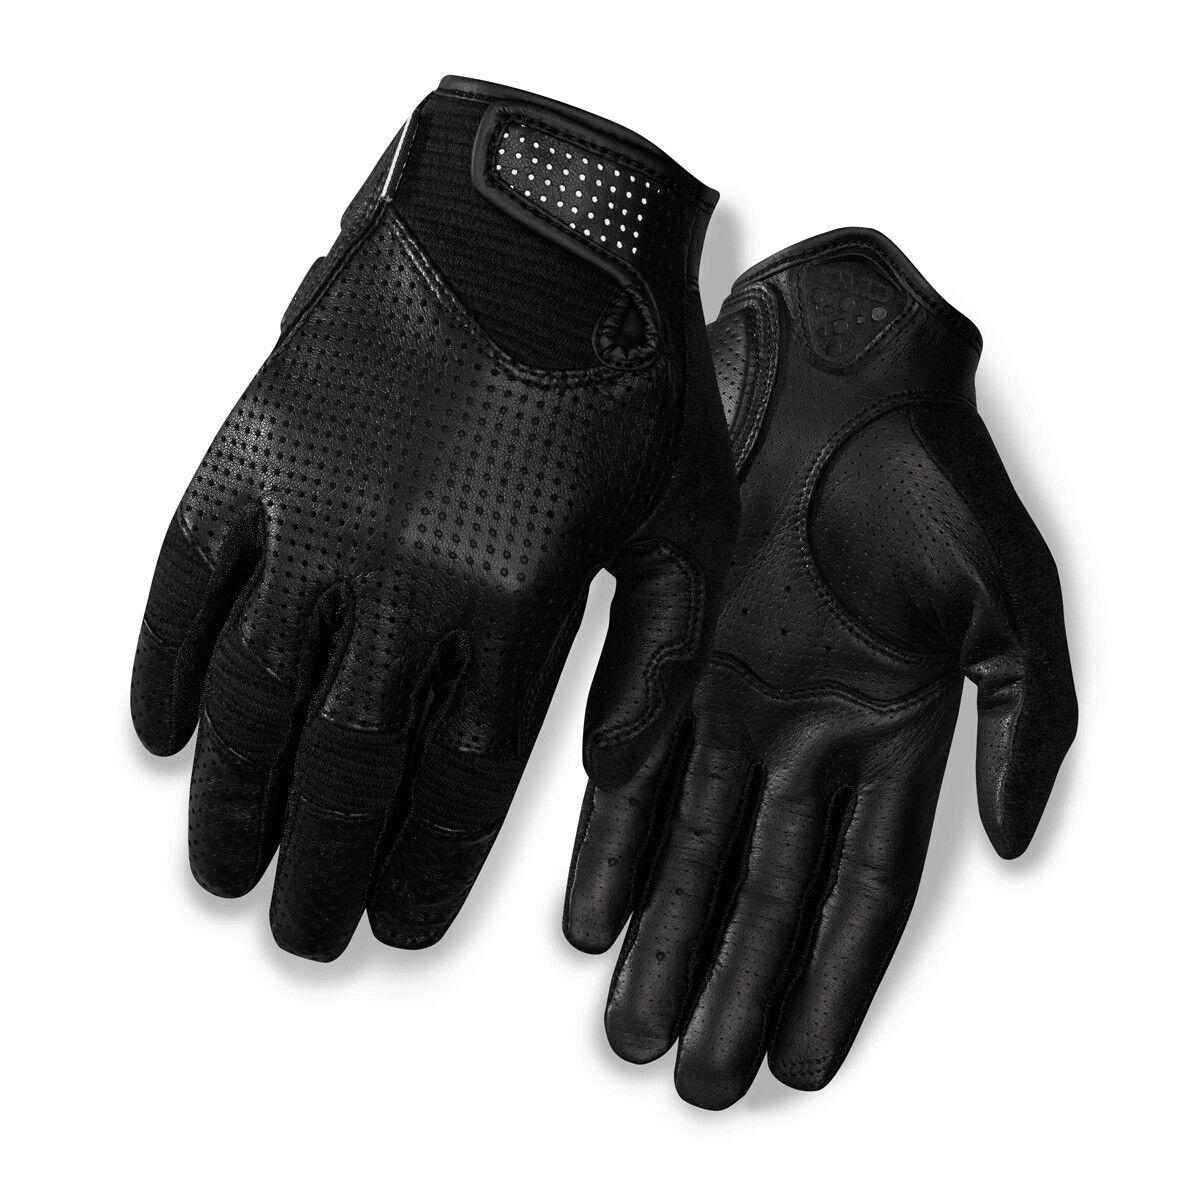 Giro LX LX Giro Fahrrad Handschuhe lang schwarz 2019 f5b99c